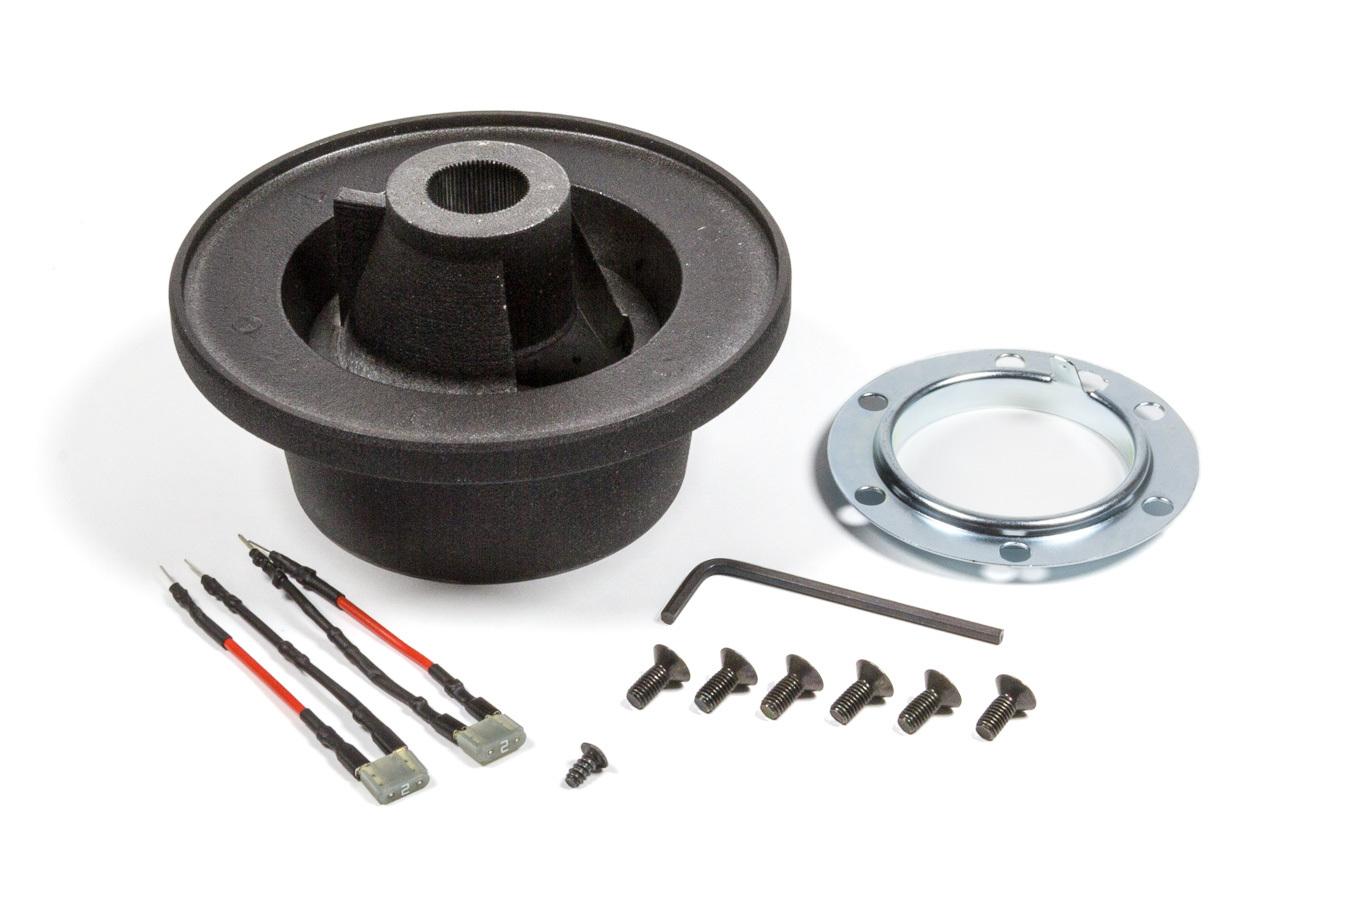 Momo 2013 Steering Wheel Adapter, Momo Wheel to OE Column, Hardware / Hub, Aluminum, Matte Black Trim, BMW 3 Series E90, Kit